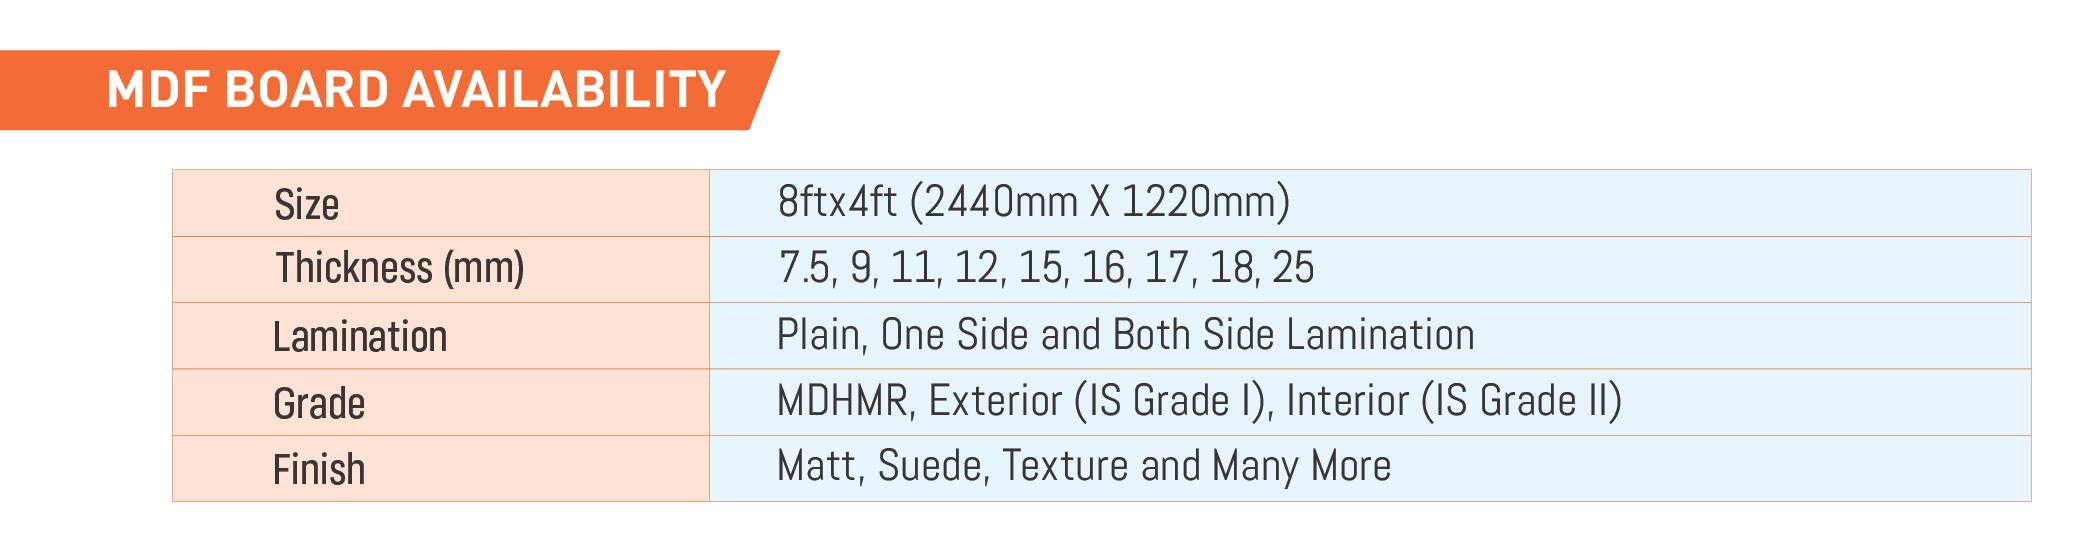 MDF Board Specification